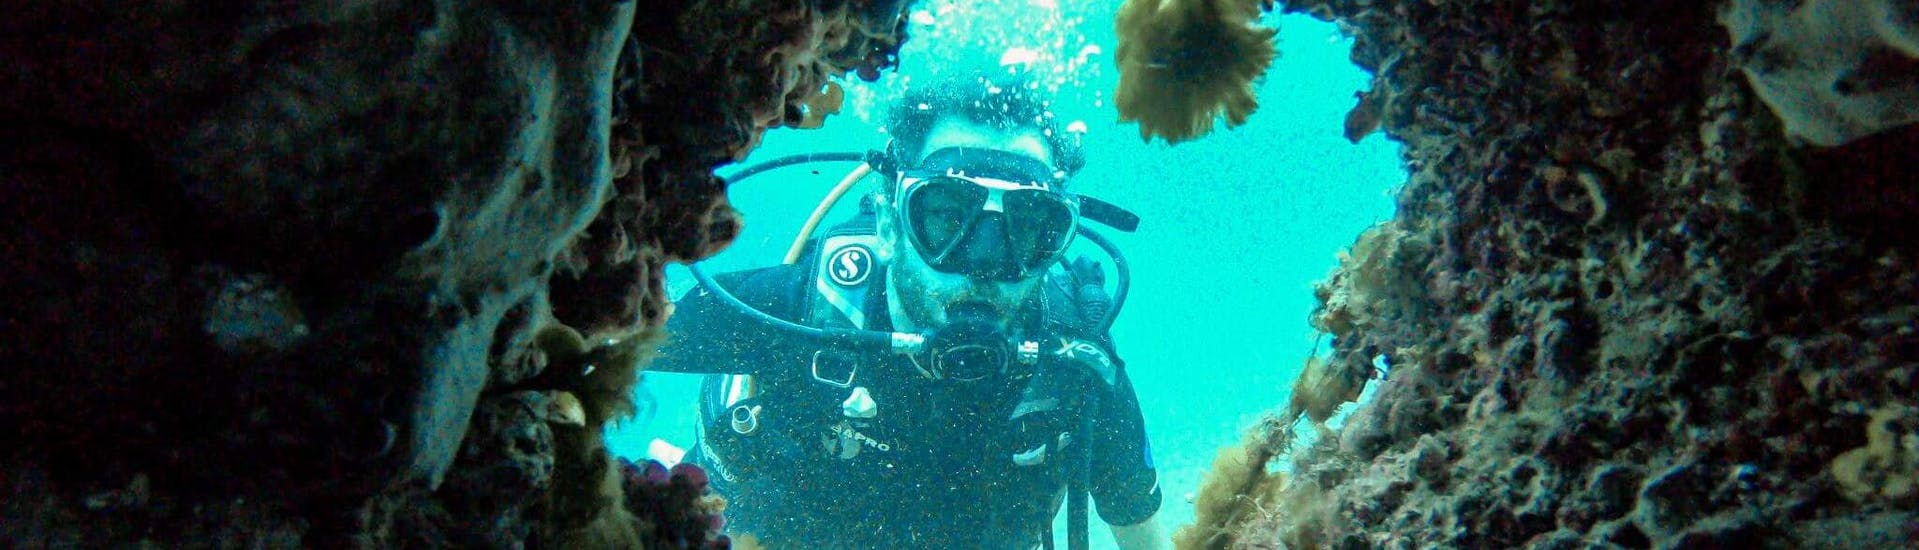 Trial Scuba Diving Course for Beginners - Discover Scuba